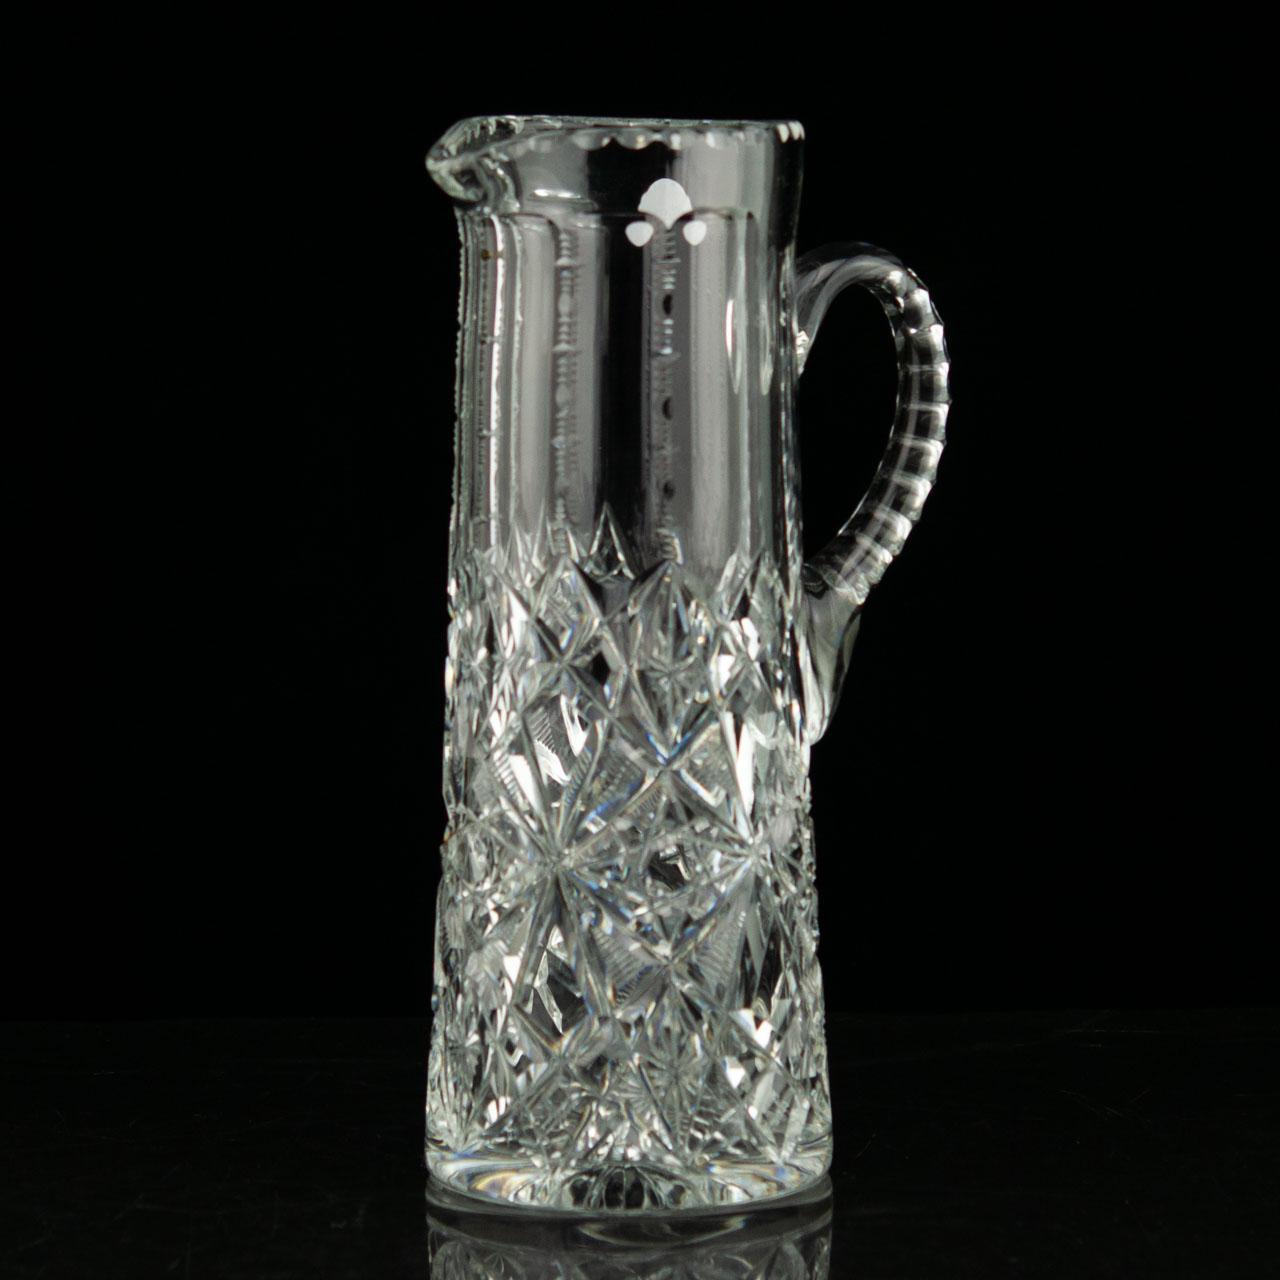 1038ec2b42a Antiik kristall kann - Idla Antiik